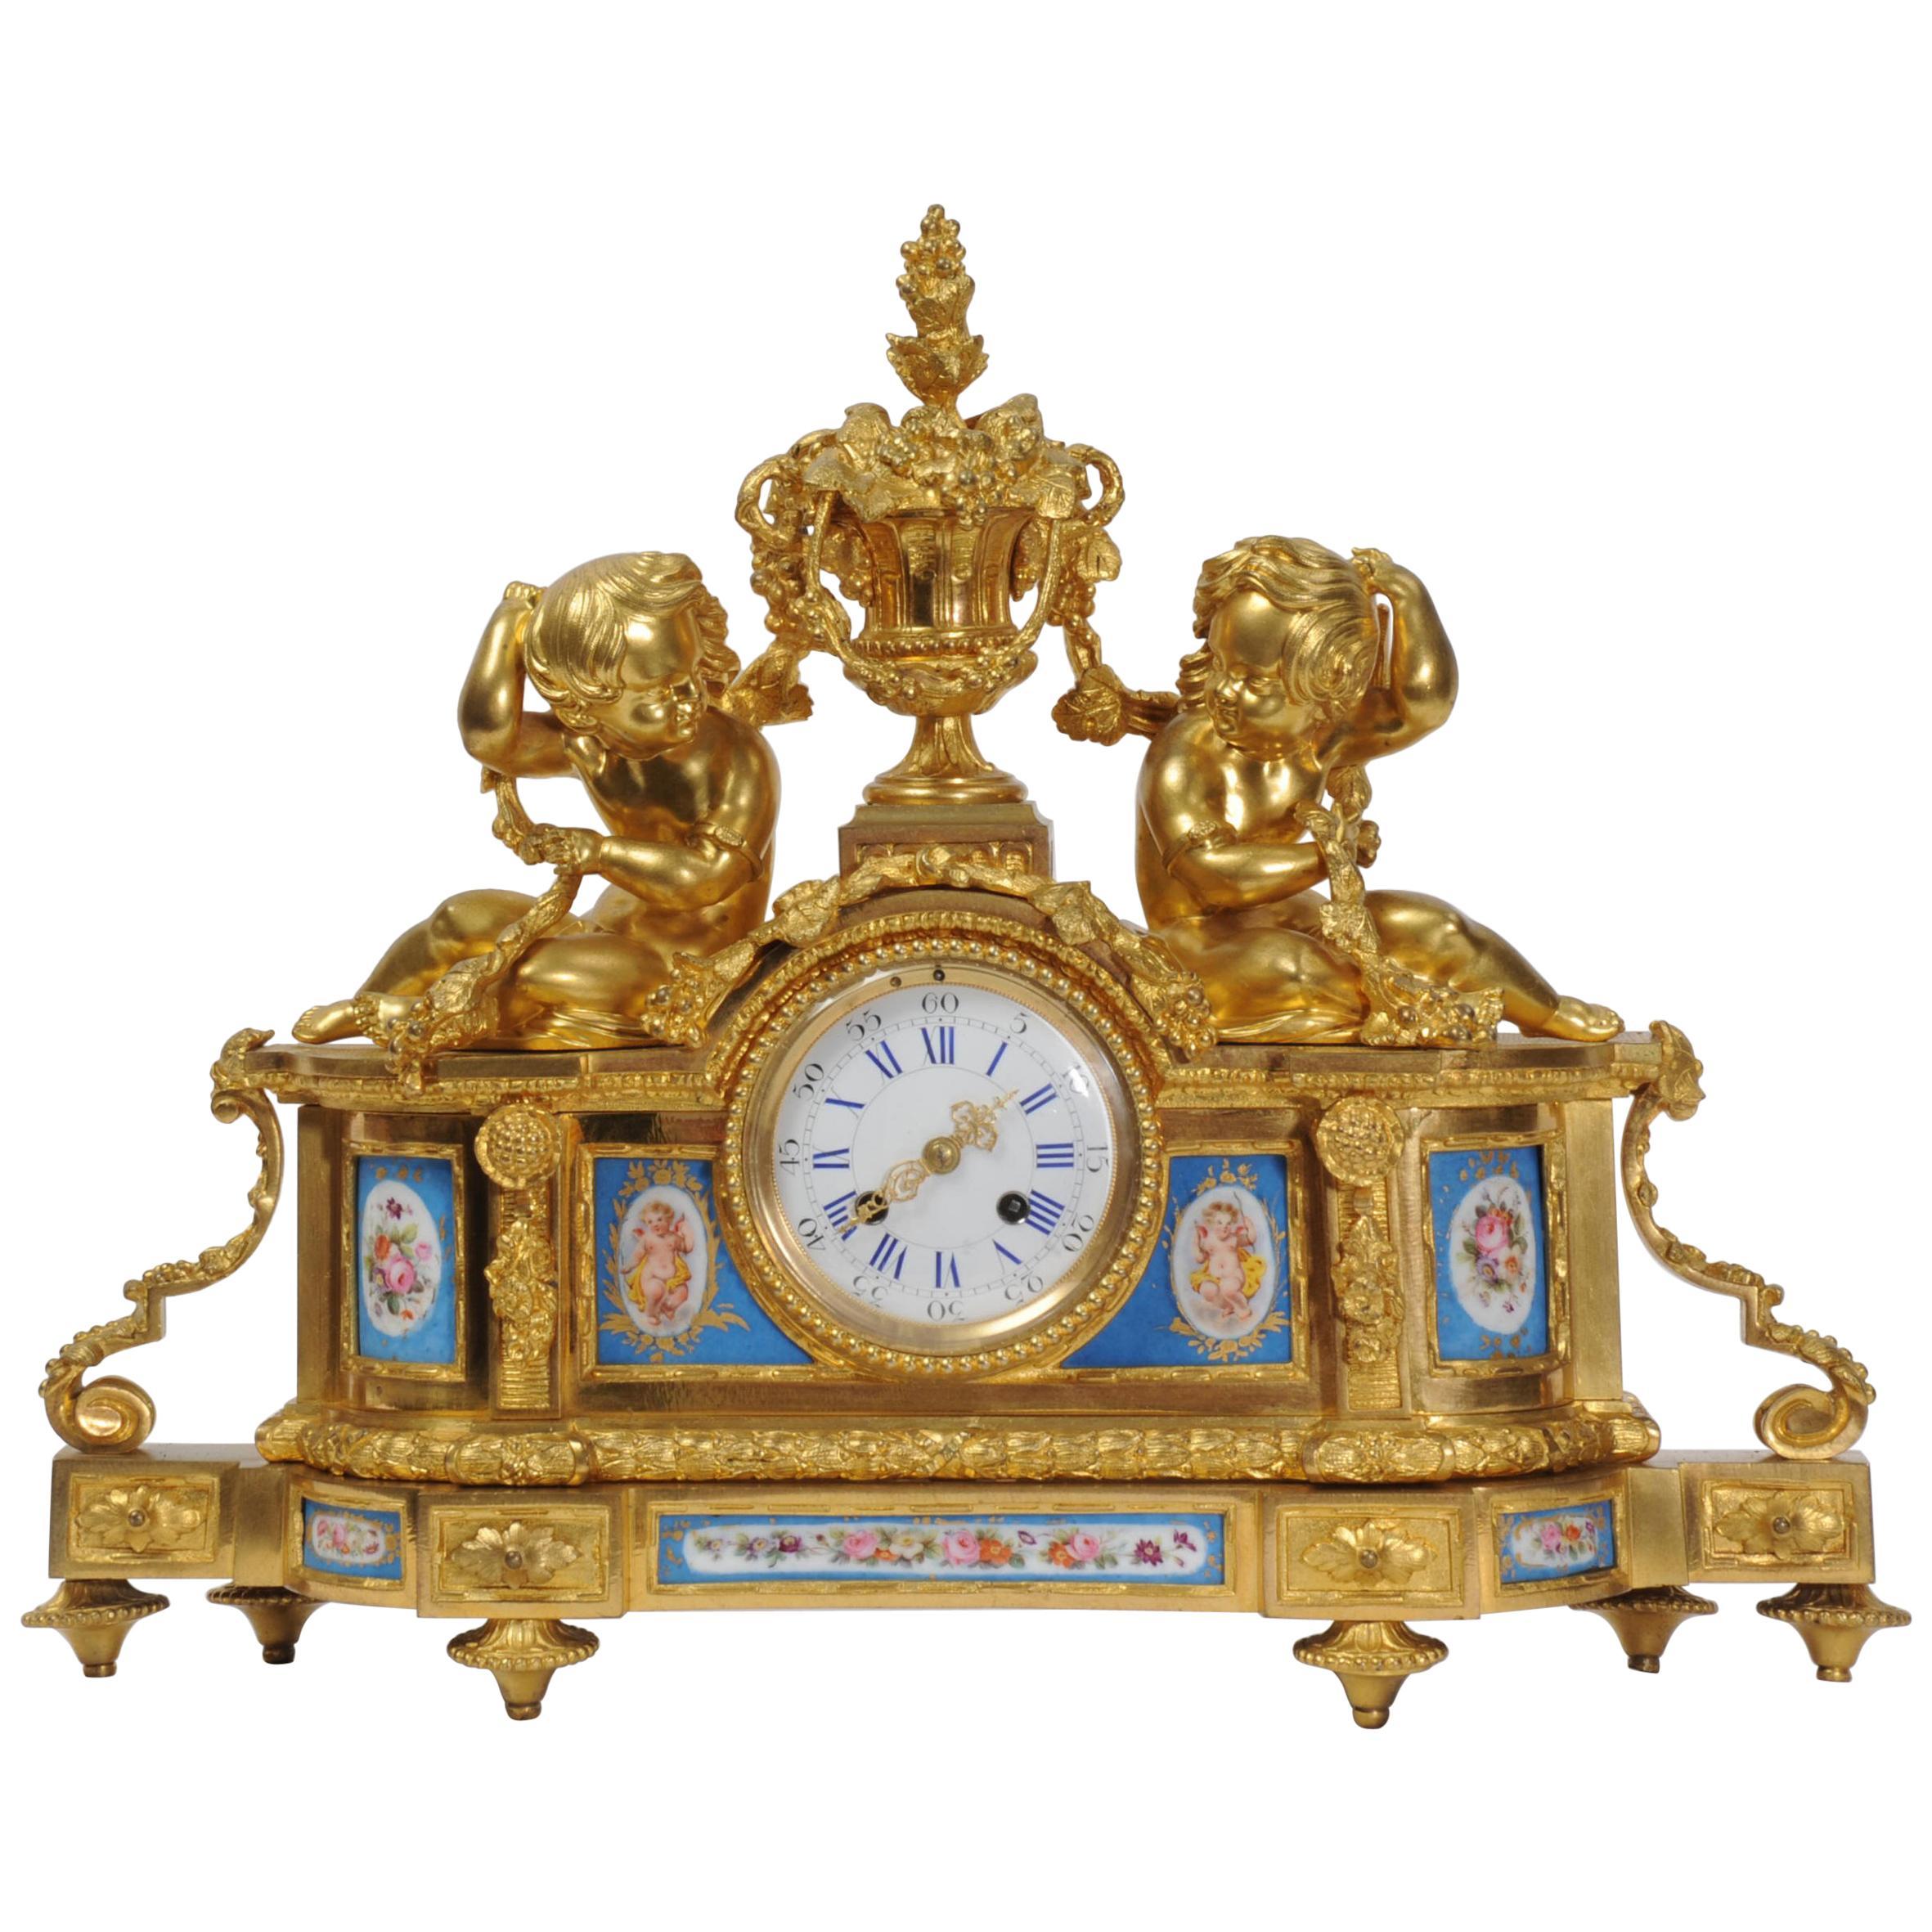 Large Ormolu and Sèvres Porcelain Antique French Clock, Wine Grapes Cherubs